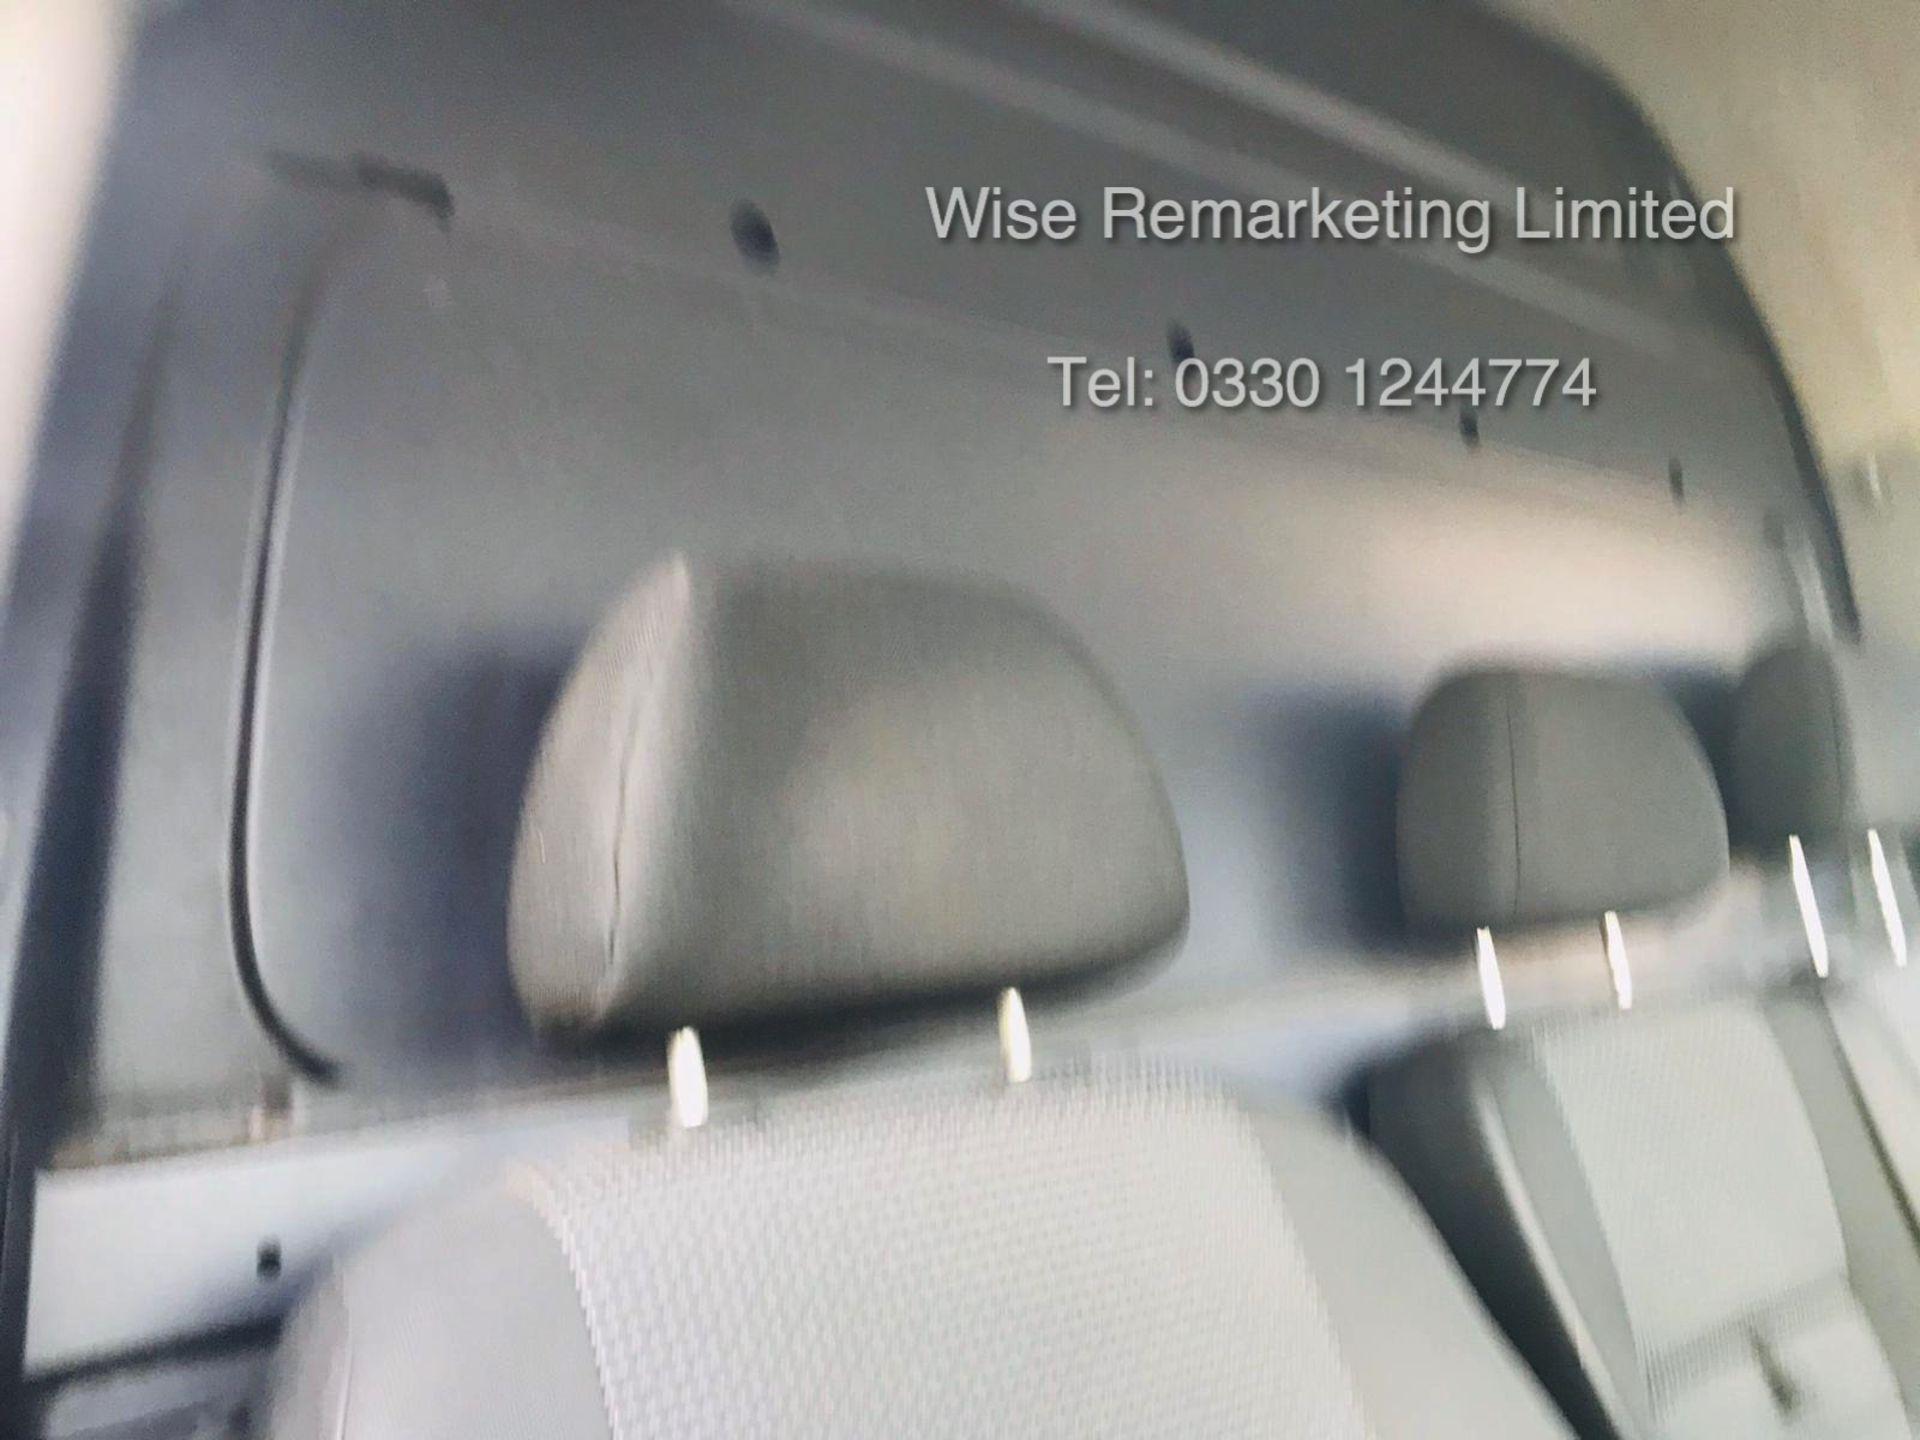 Mercedes Sprinter 313 CDI 2.1 TD Long Wheel Base 6 Speed - 2014 Model - Image 18 of 19